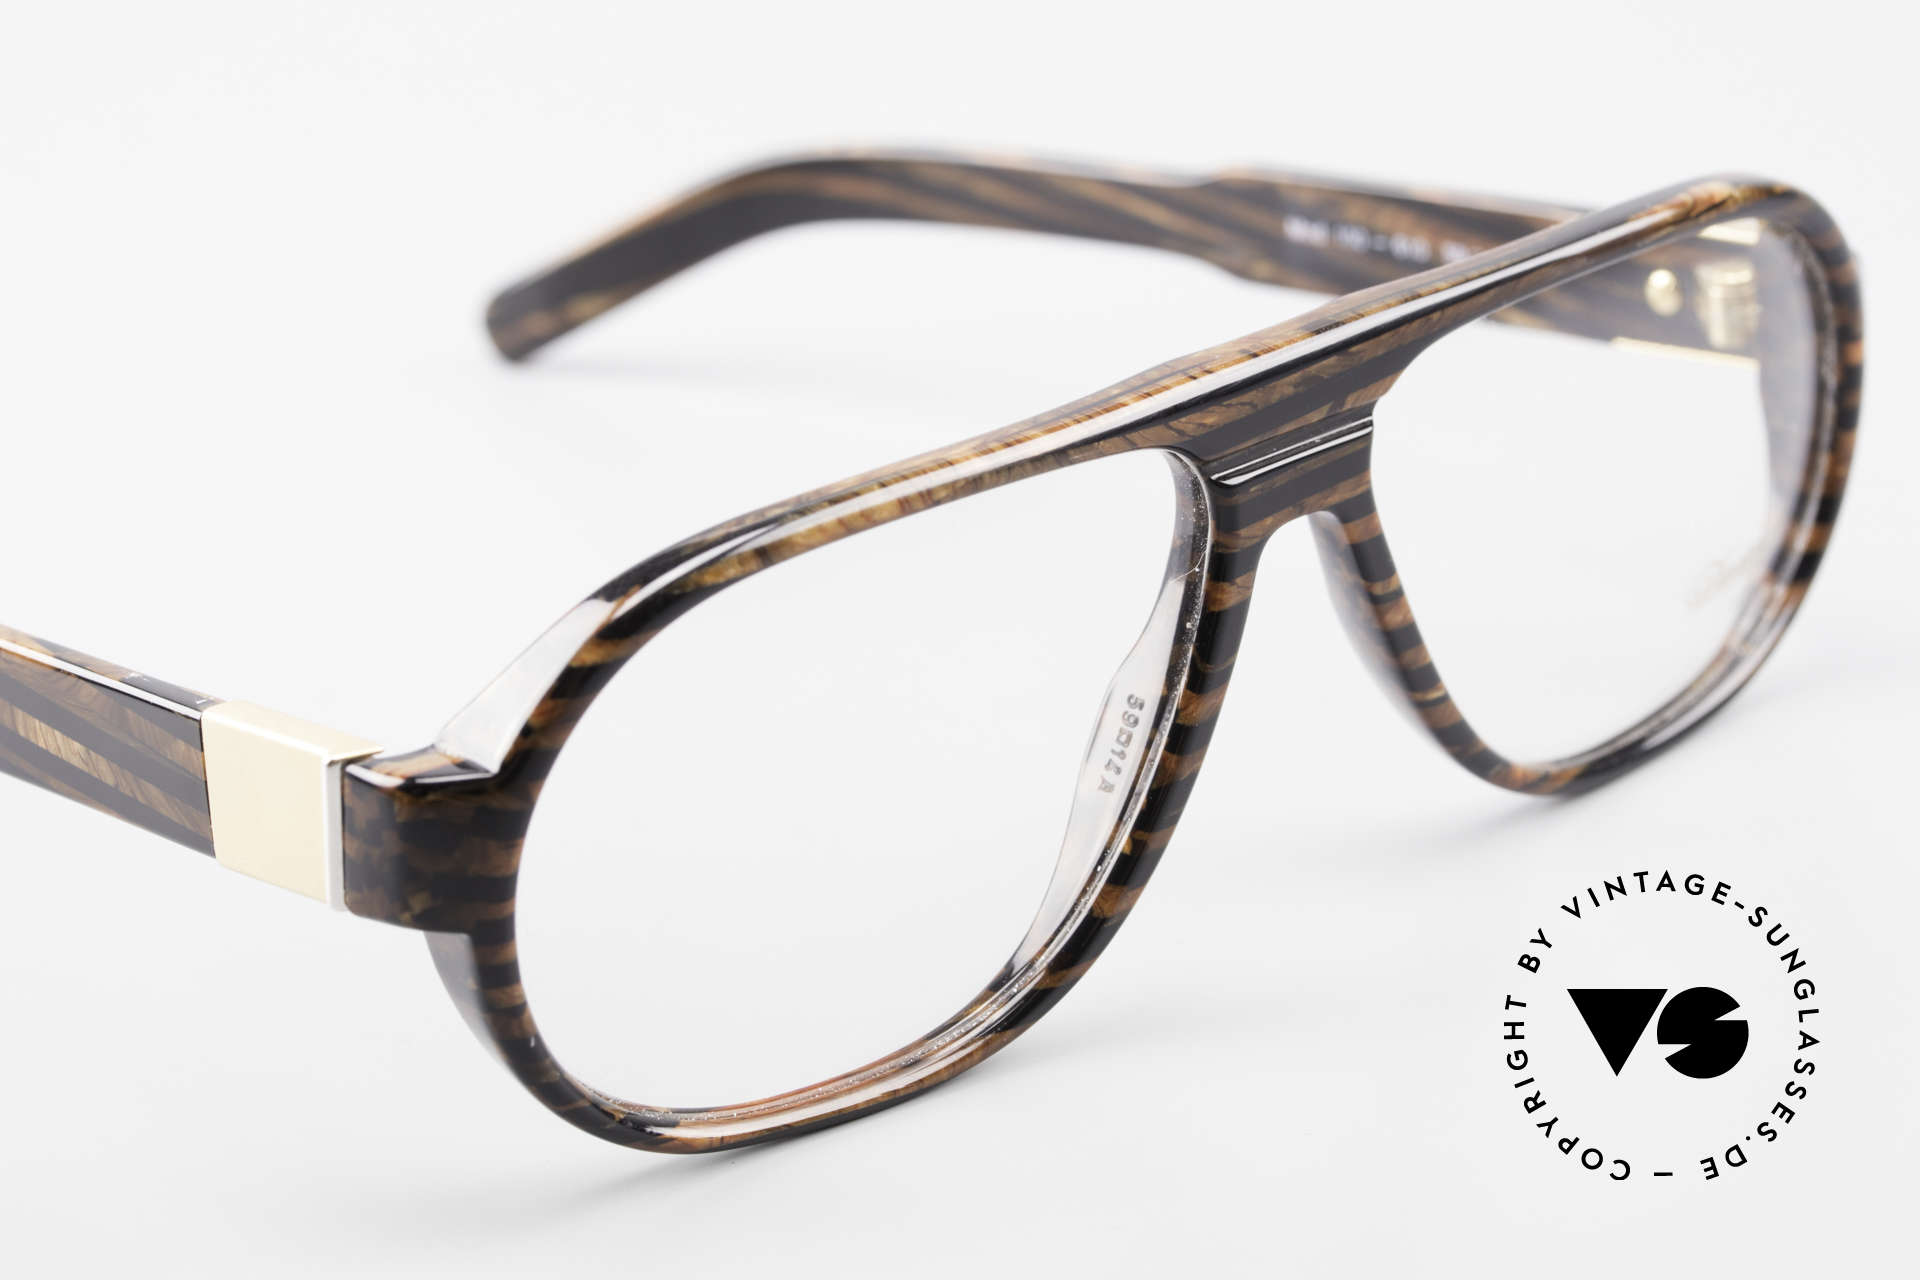 Davidoff 100 90's Men's Vintage Glasses, unworn (like all our Davidoff eyeglasses from the 90s), Made for Men